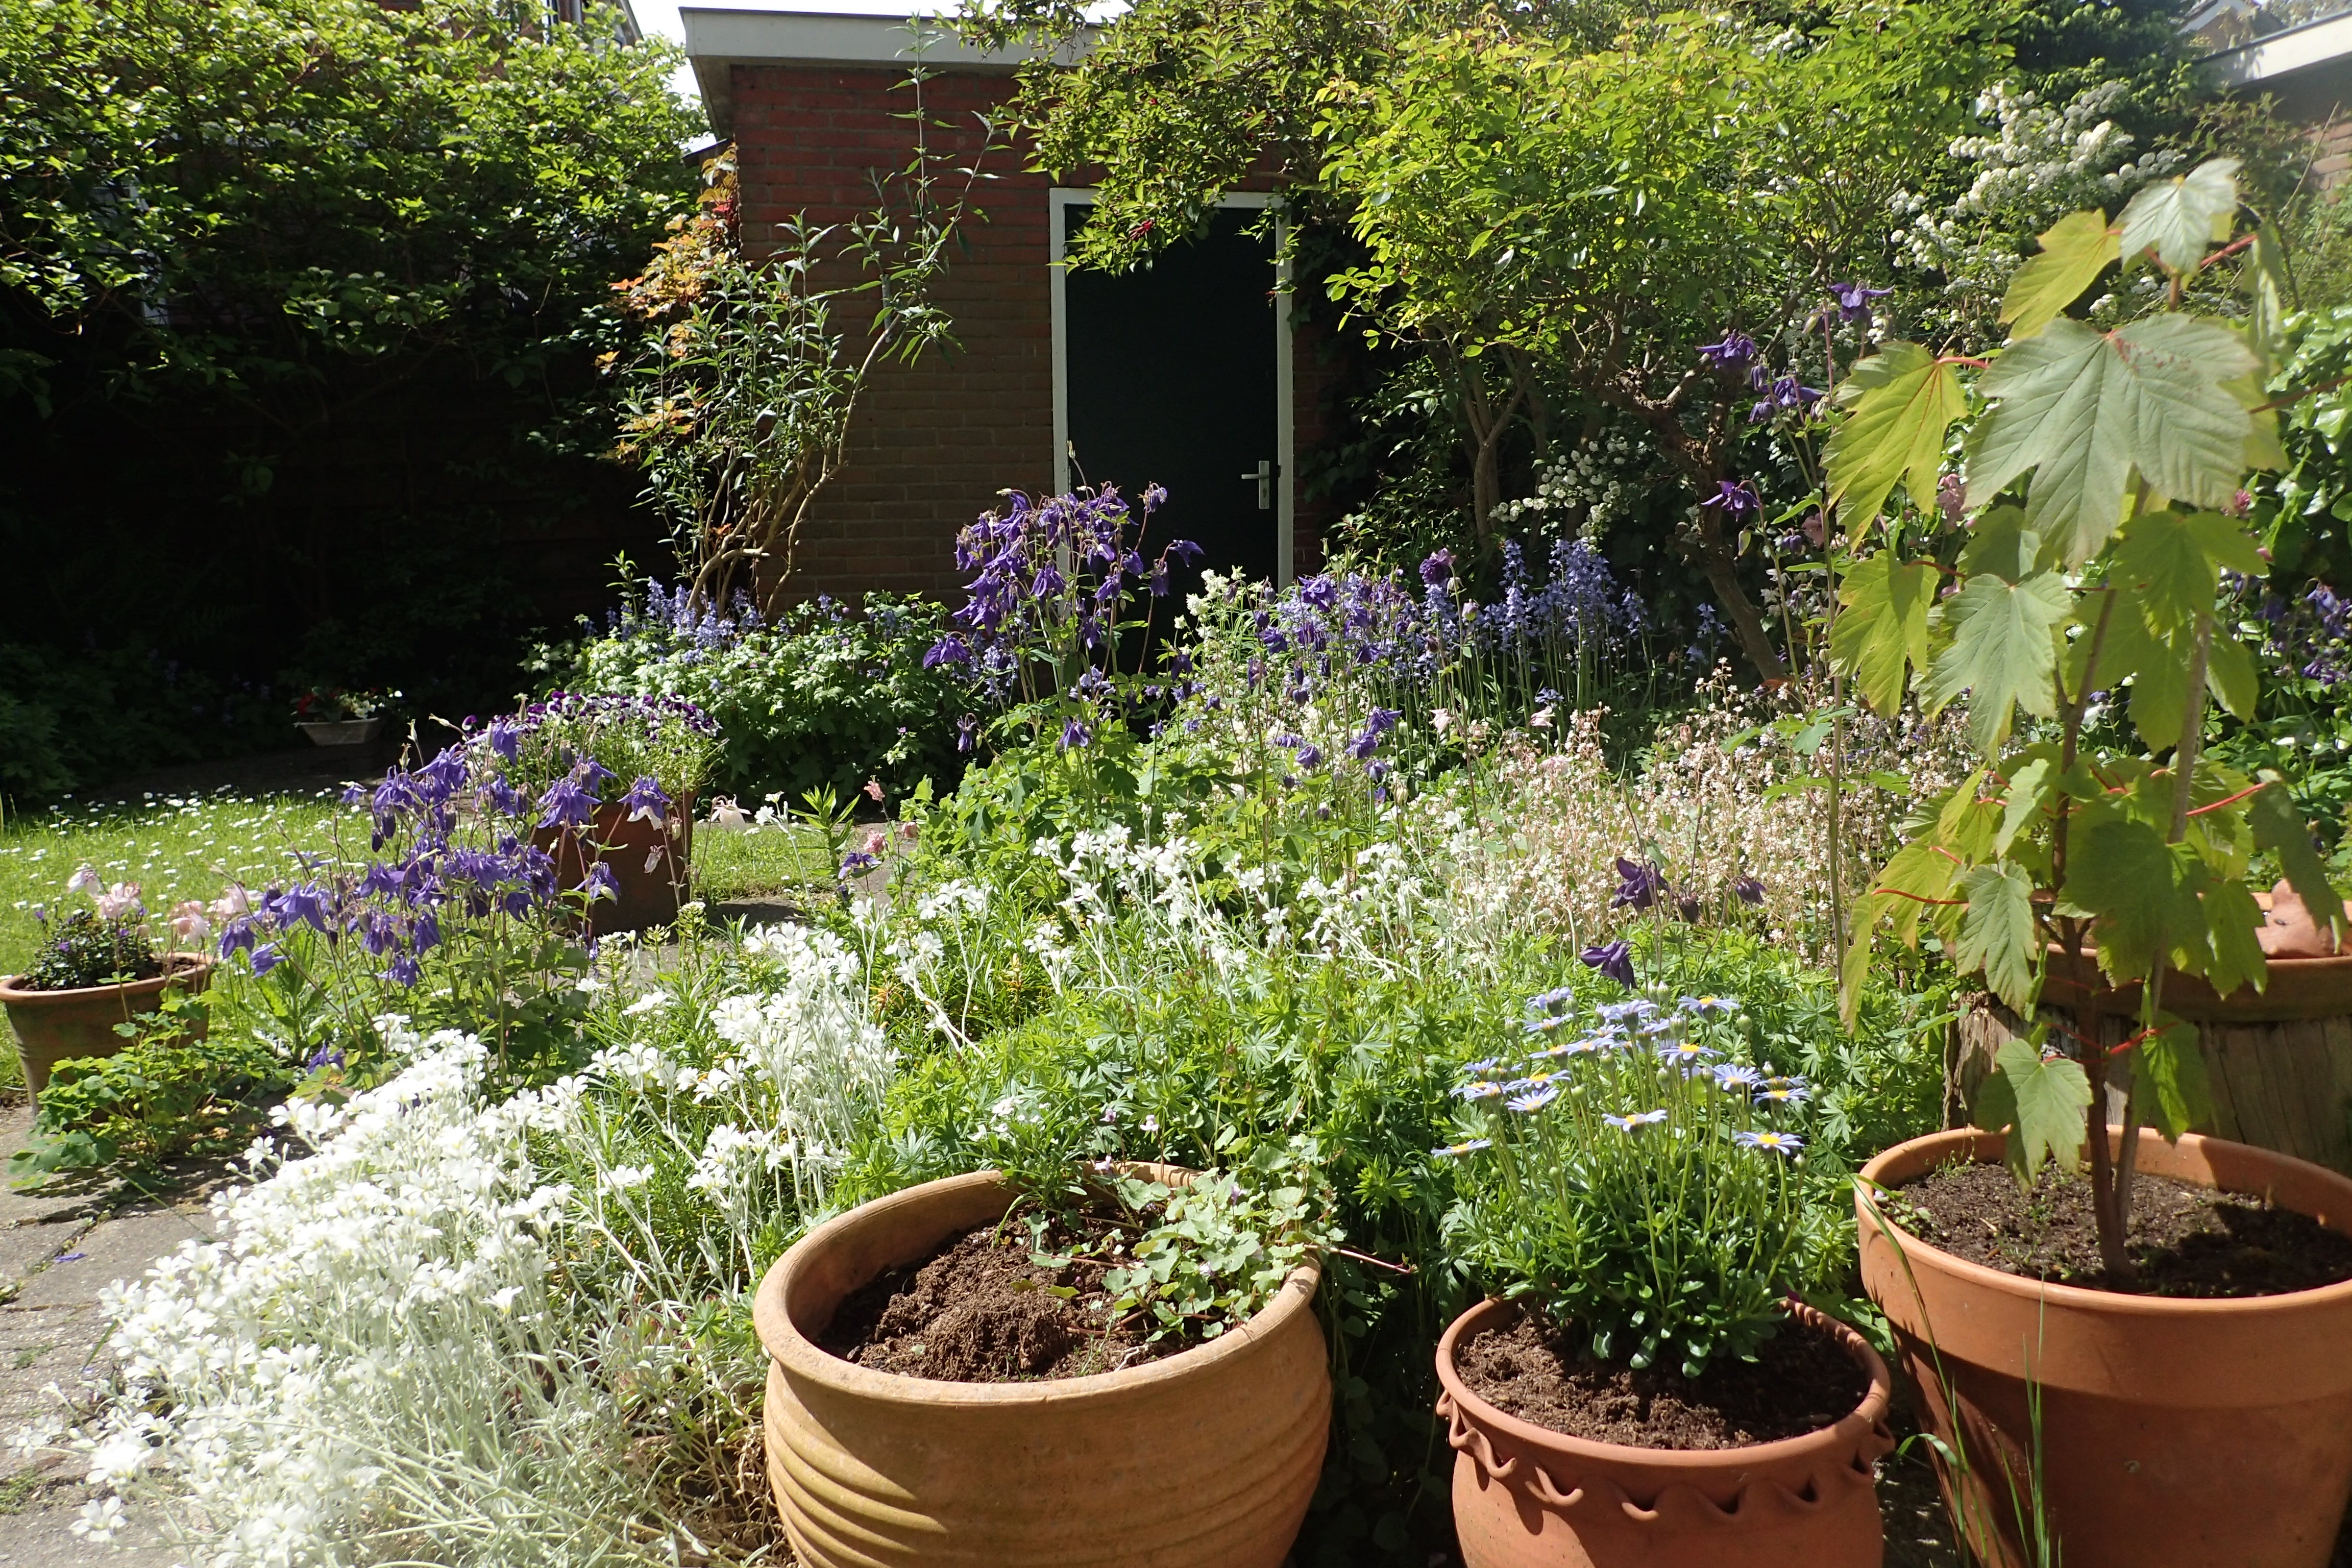 Cursus tuinen Natuurlijk, 10 april – 26 mei, Oegstgeest